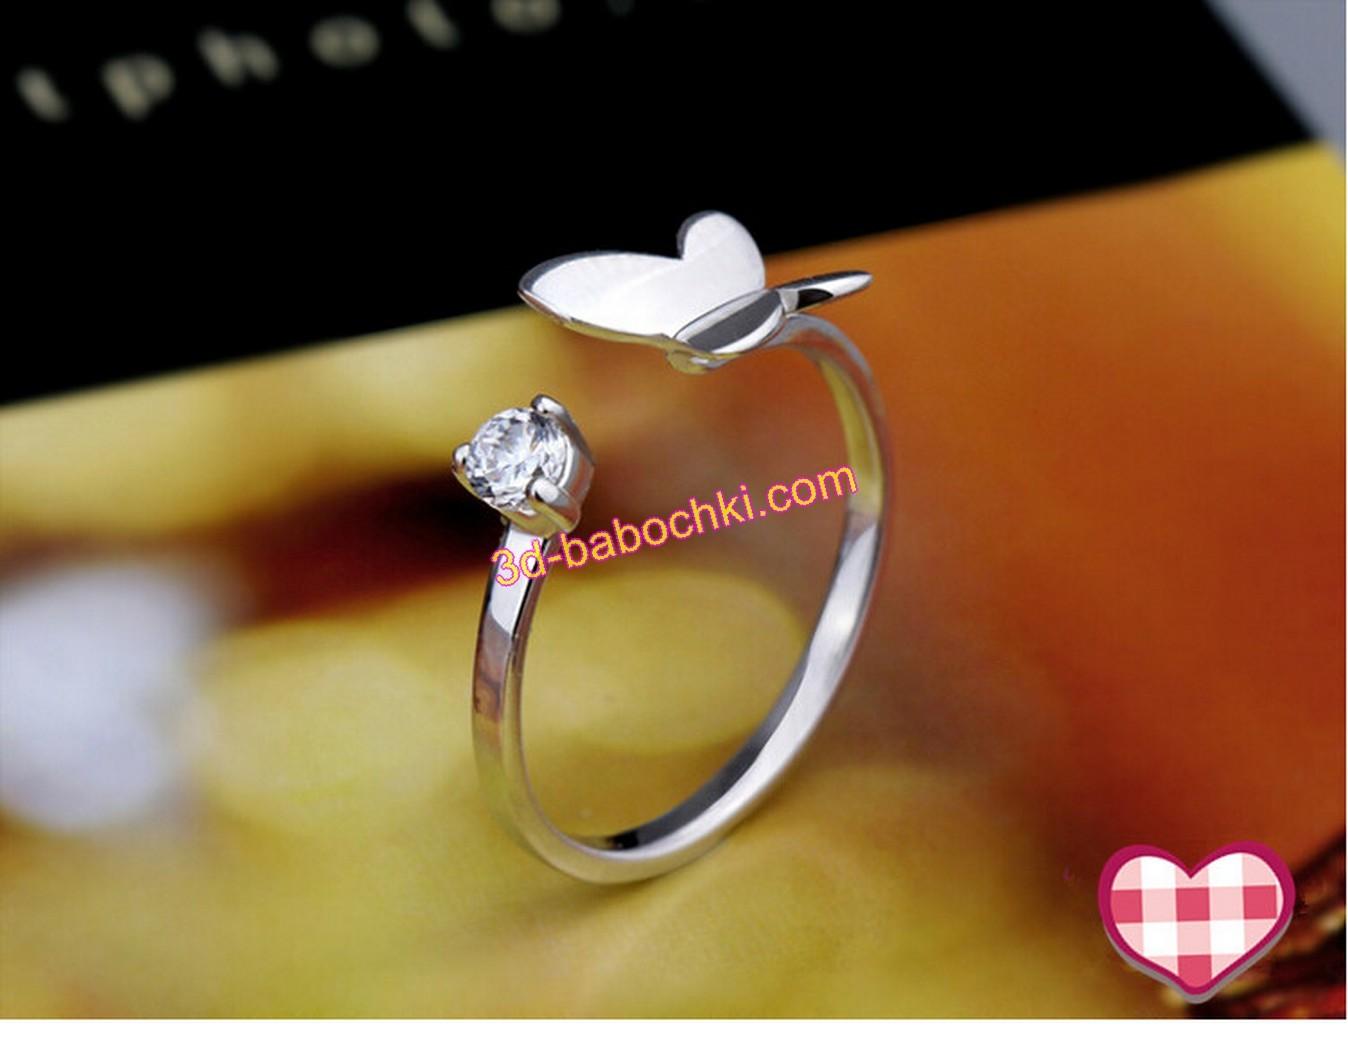 купить кольцо бабочку